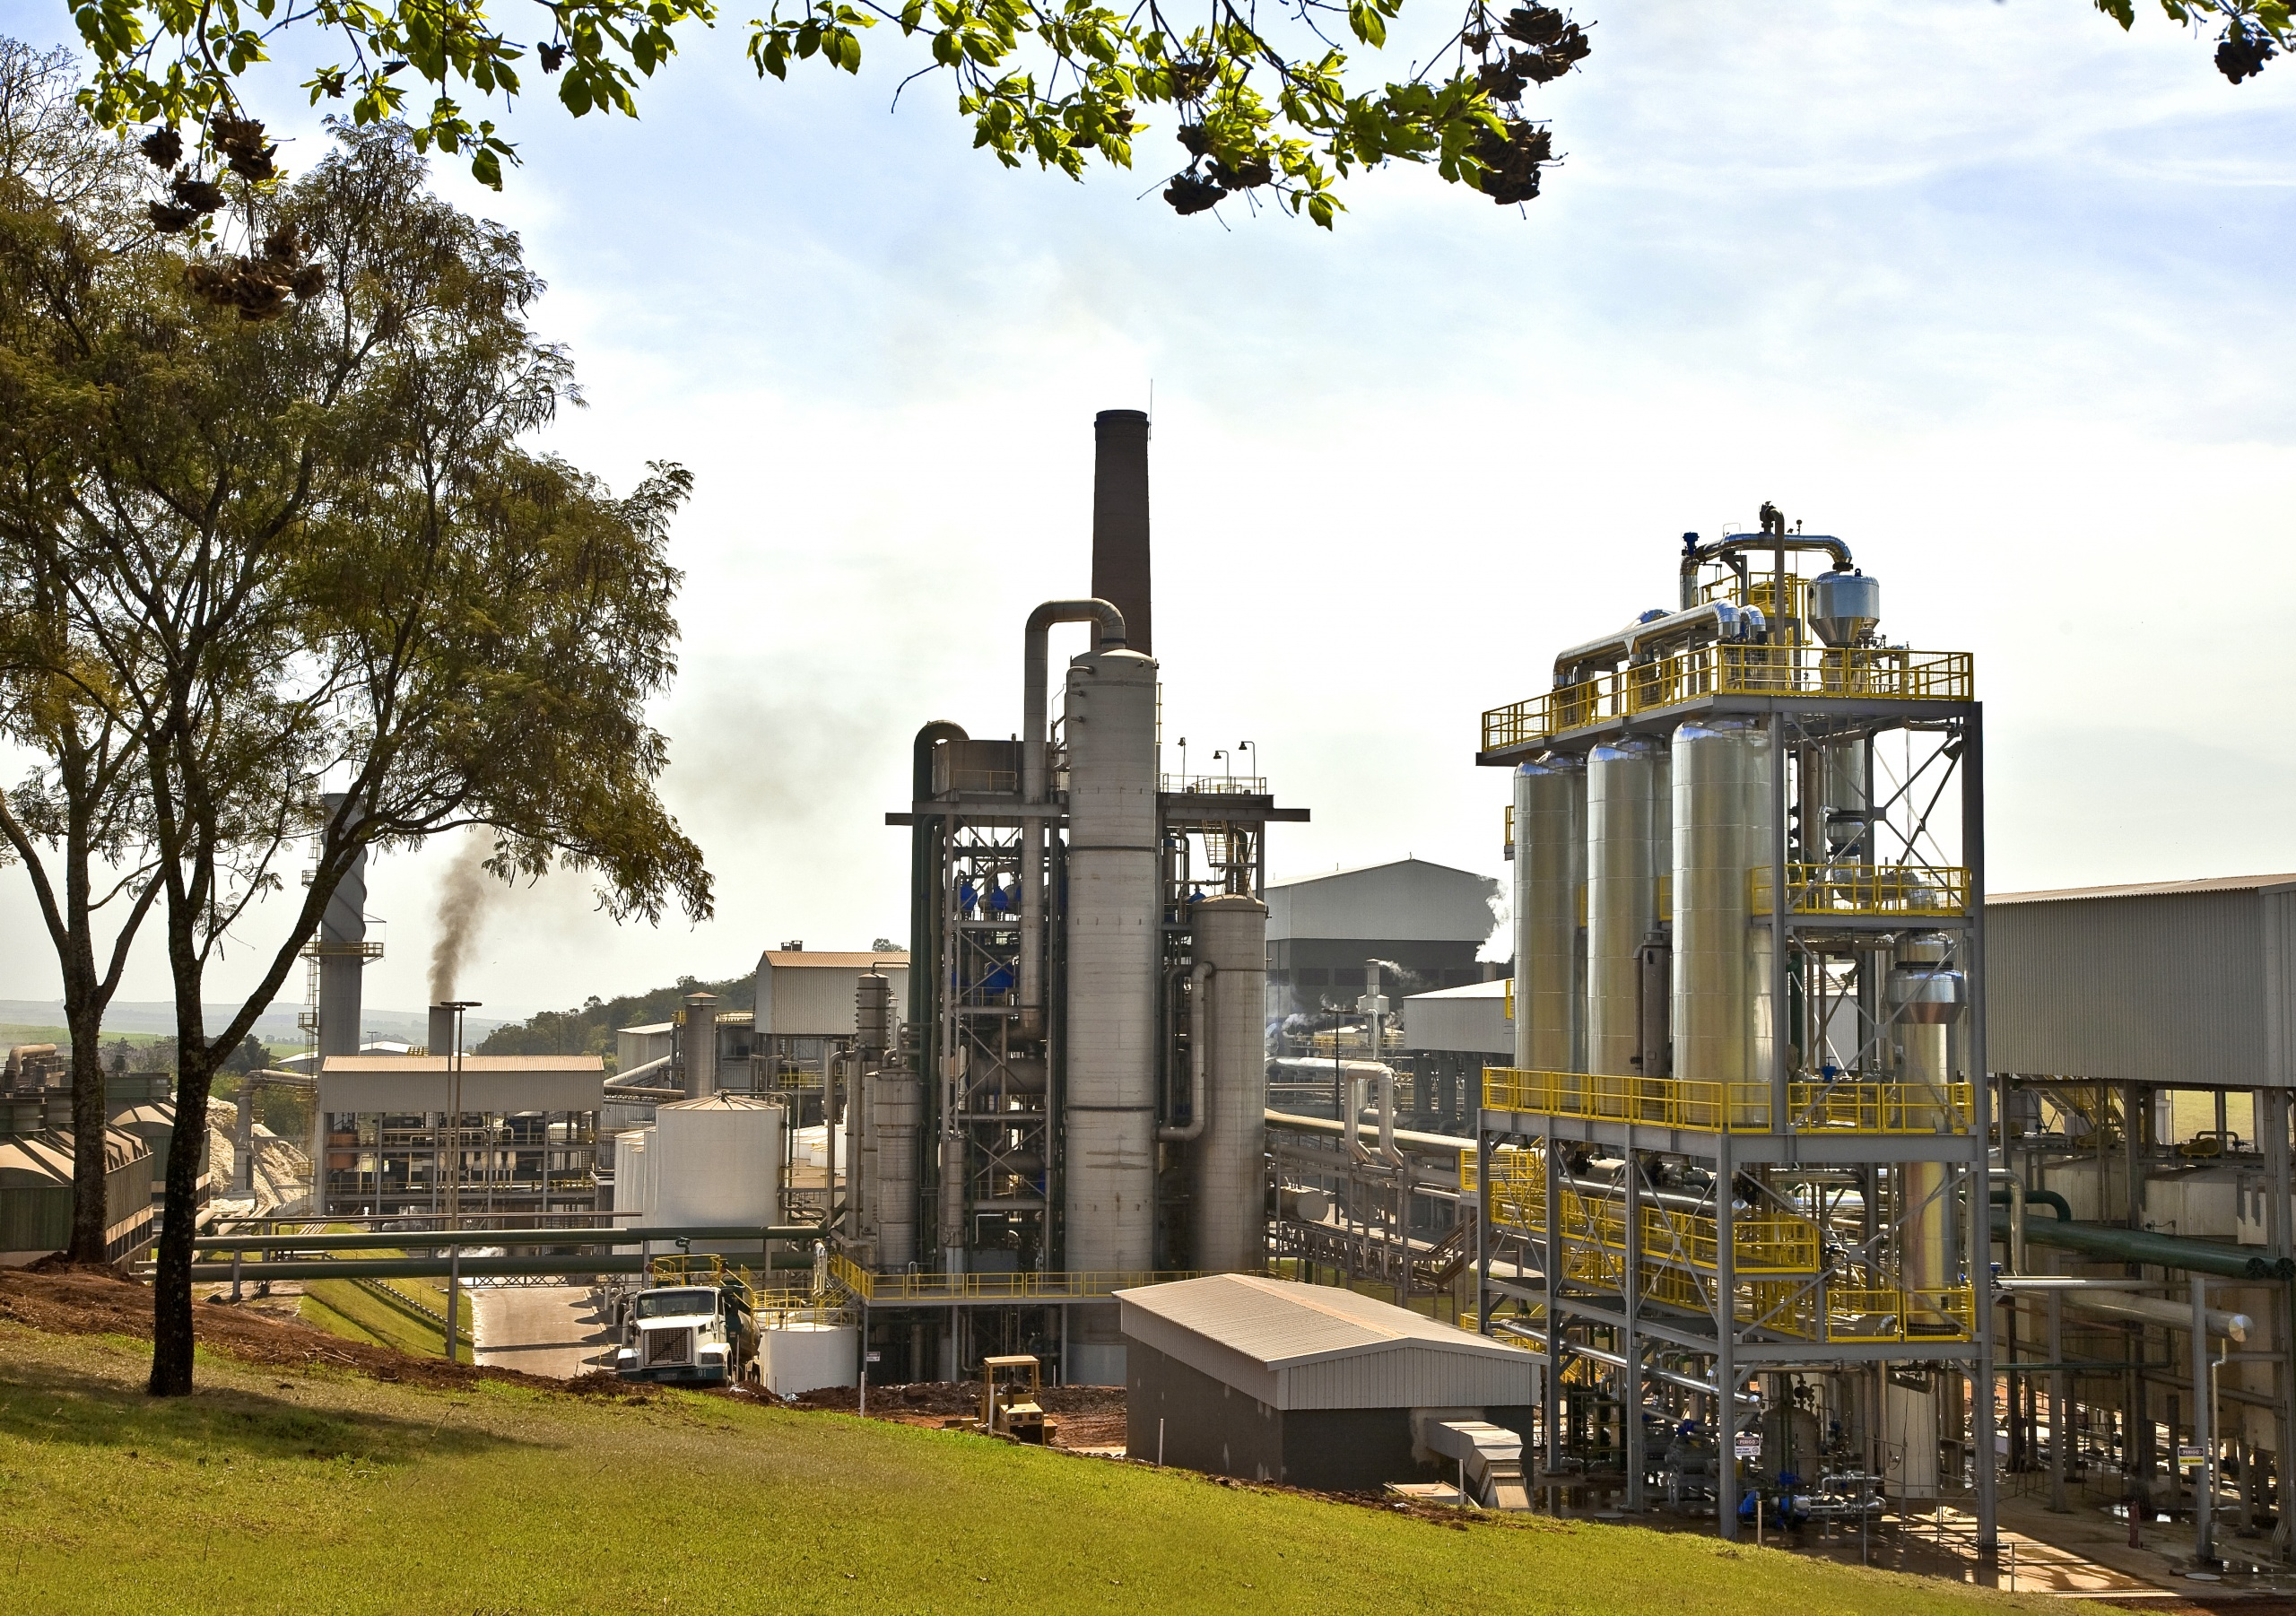 UNICA participa de webinar da EPE sobre o mercado de biocombustíveis